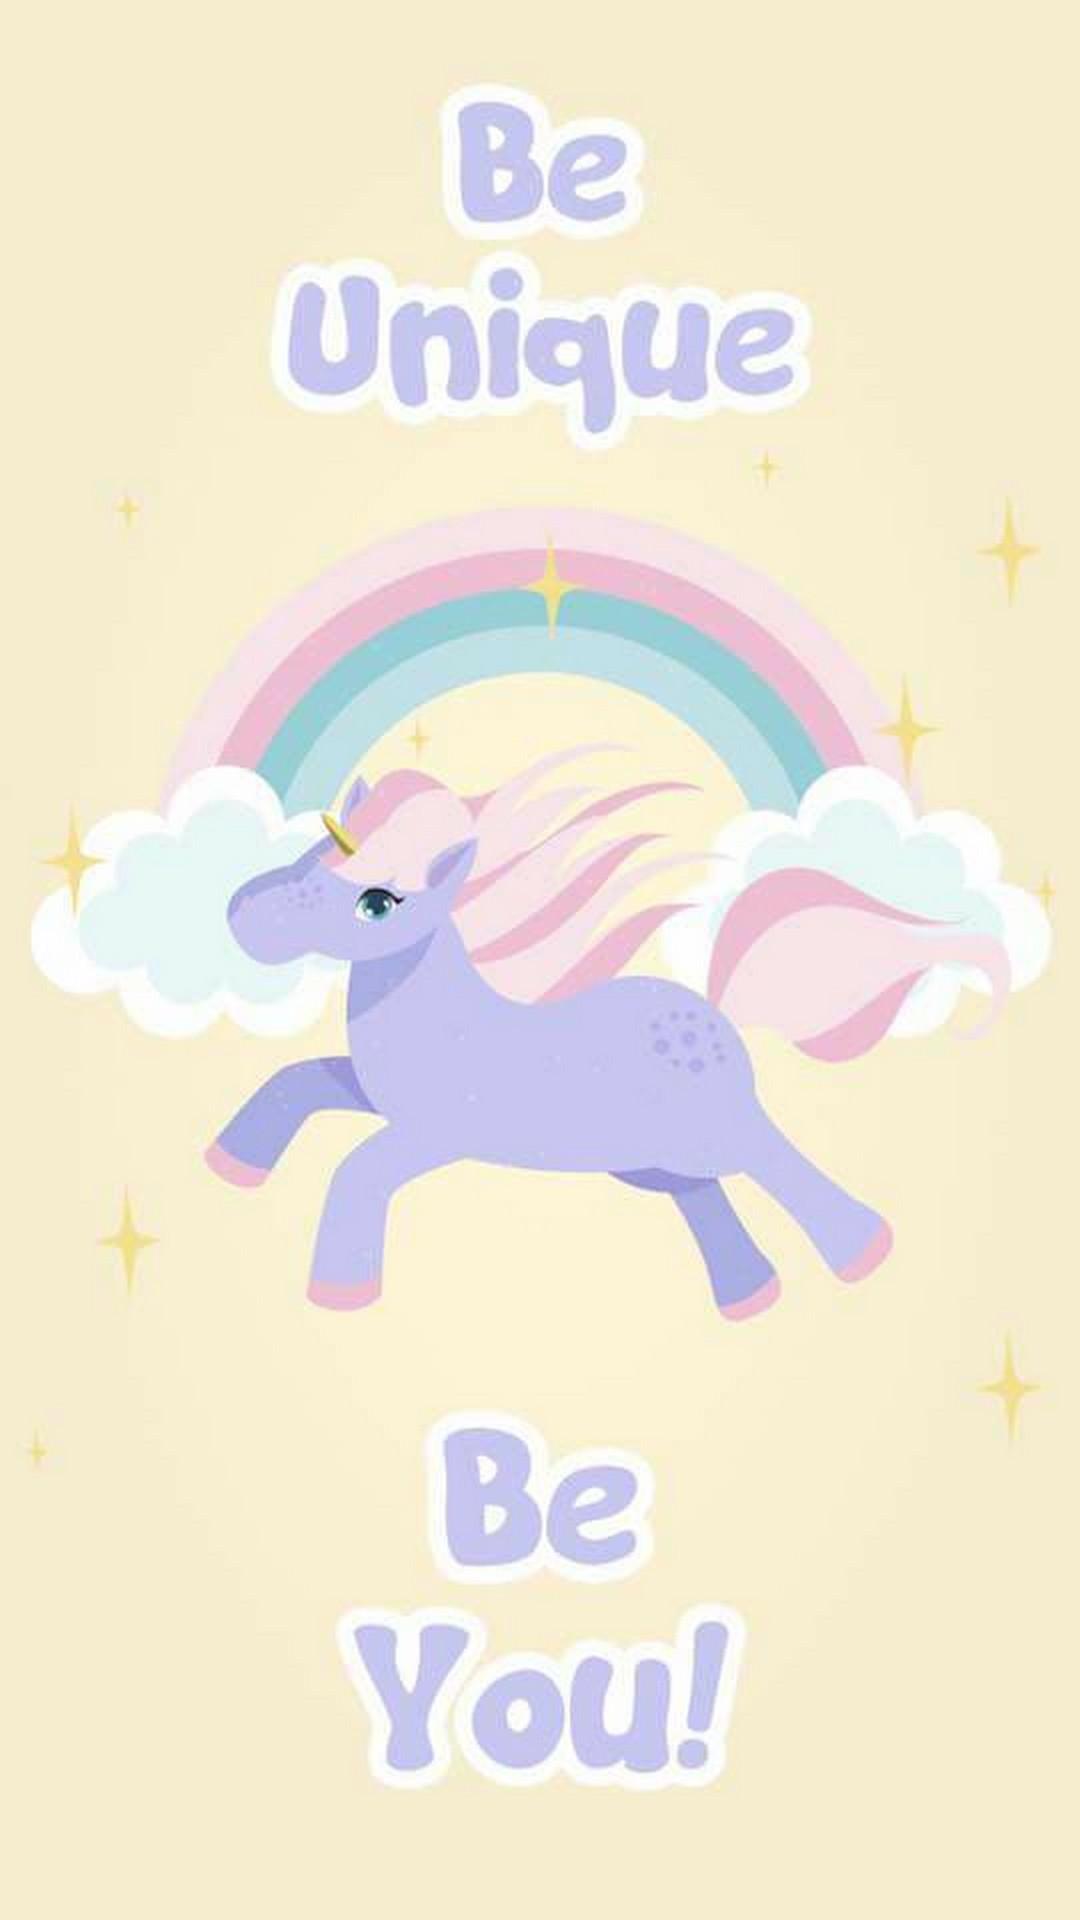 Unicorn iPhone Backgrounds   2020 Cute iPhone Wallpaper 1080x1920